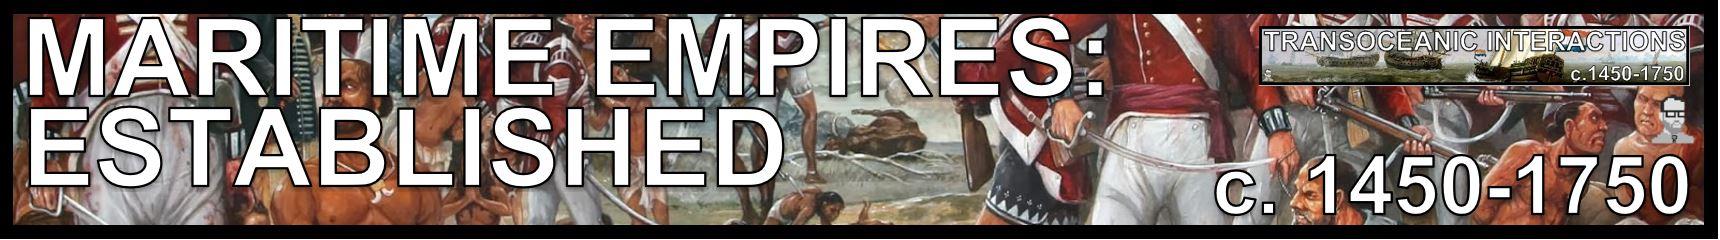 maritime empires established ap world modern freemanpedia transoceanic interactions.JPG